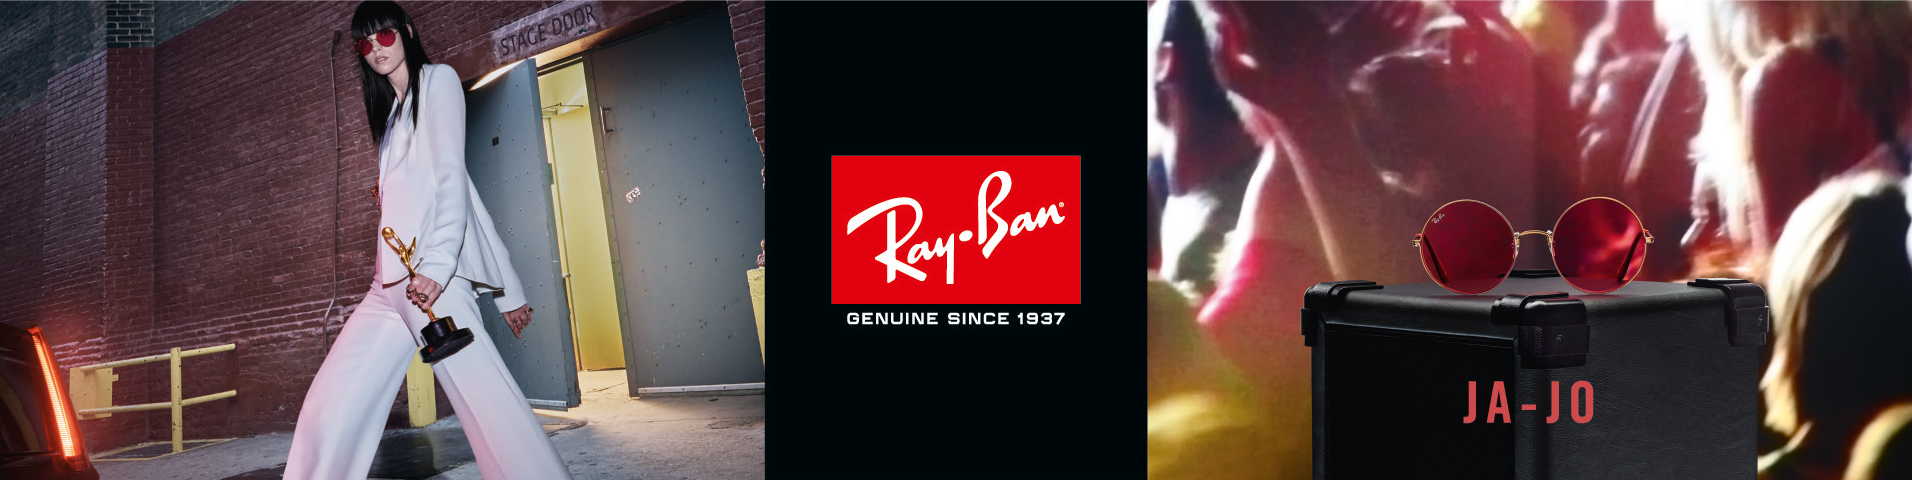 Lunettes de soleil femme Ray-Ban en ligne  Zalando a98bff92fcfe